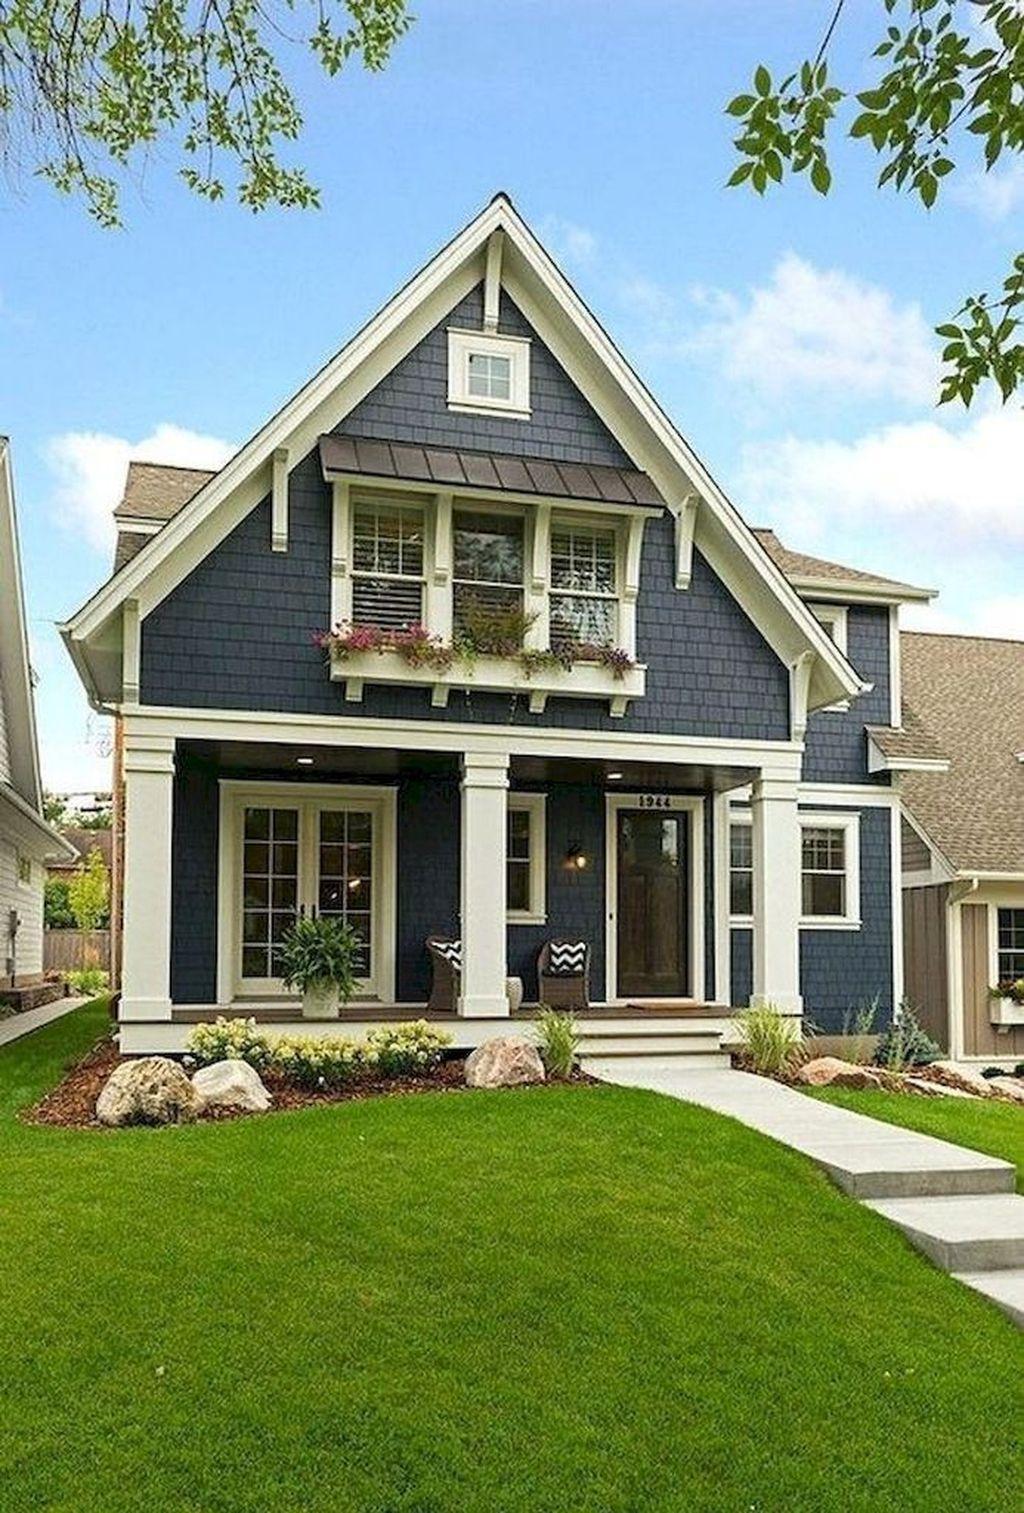 Captivating Farmhouse Exterior House Design Ideas To Copy Right Now 09